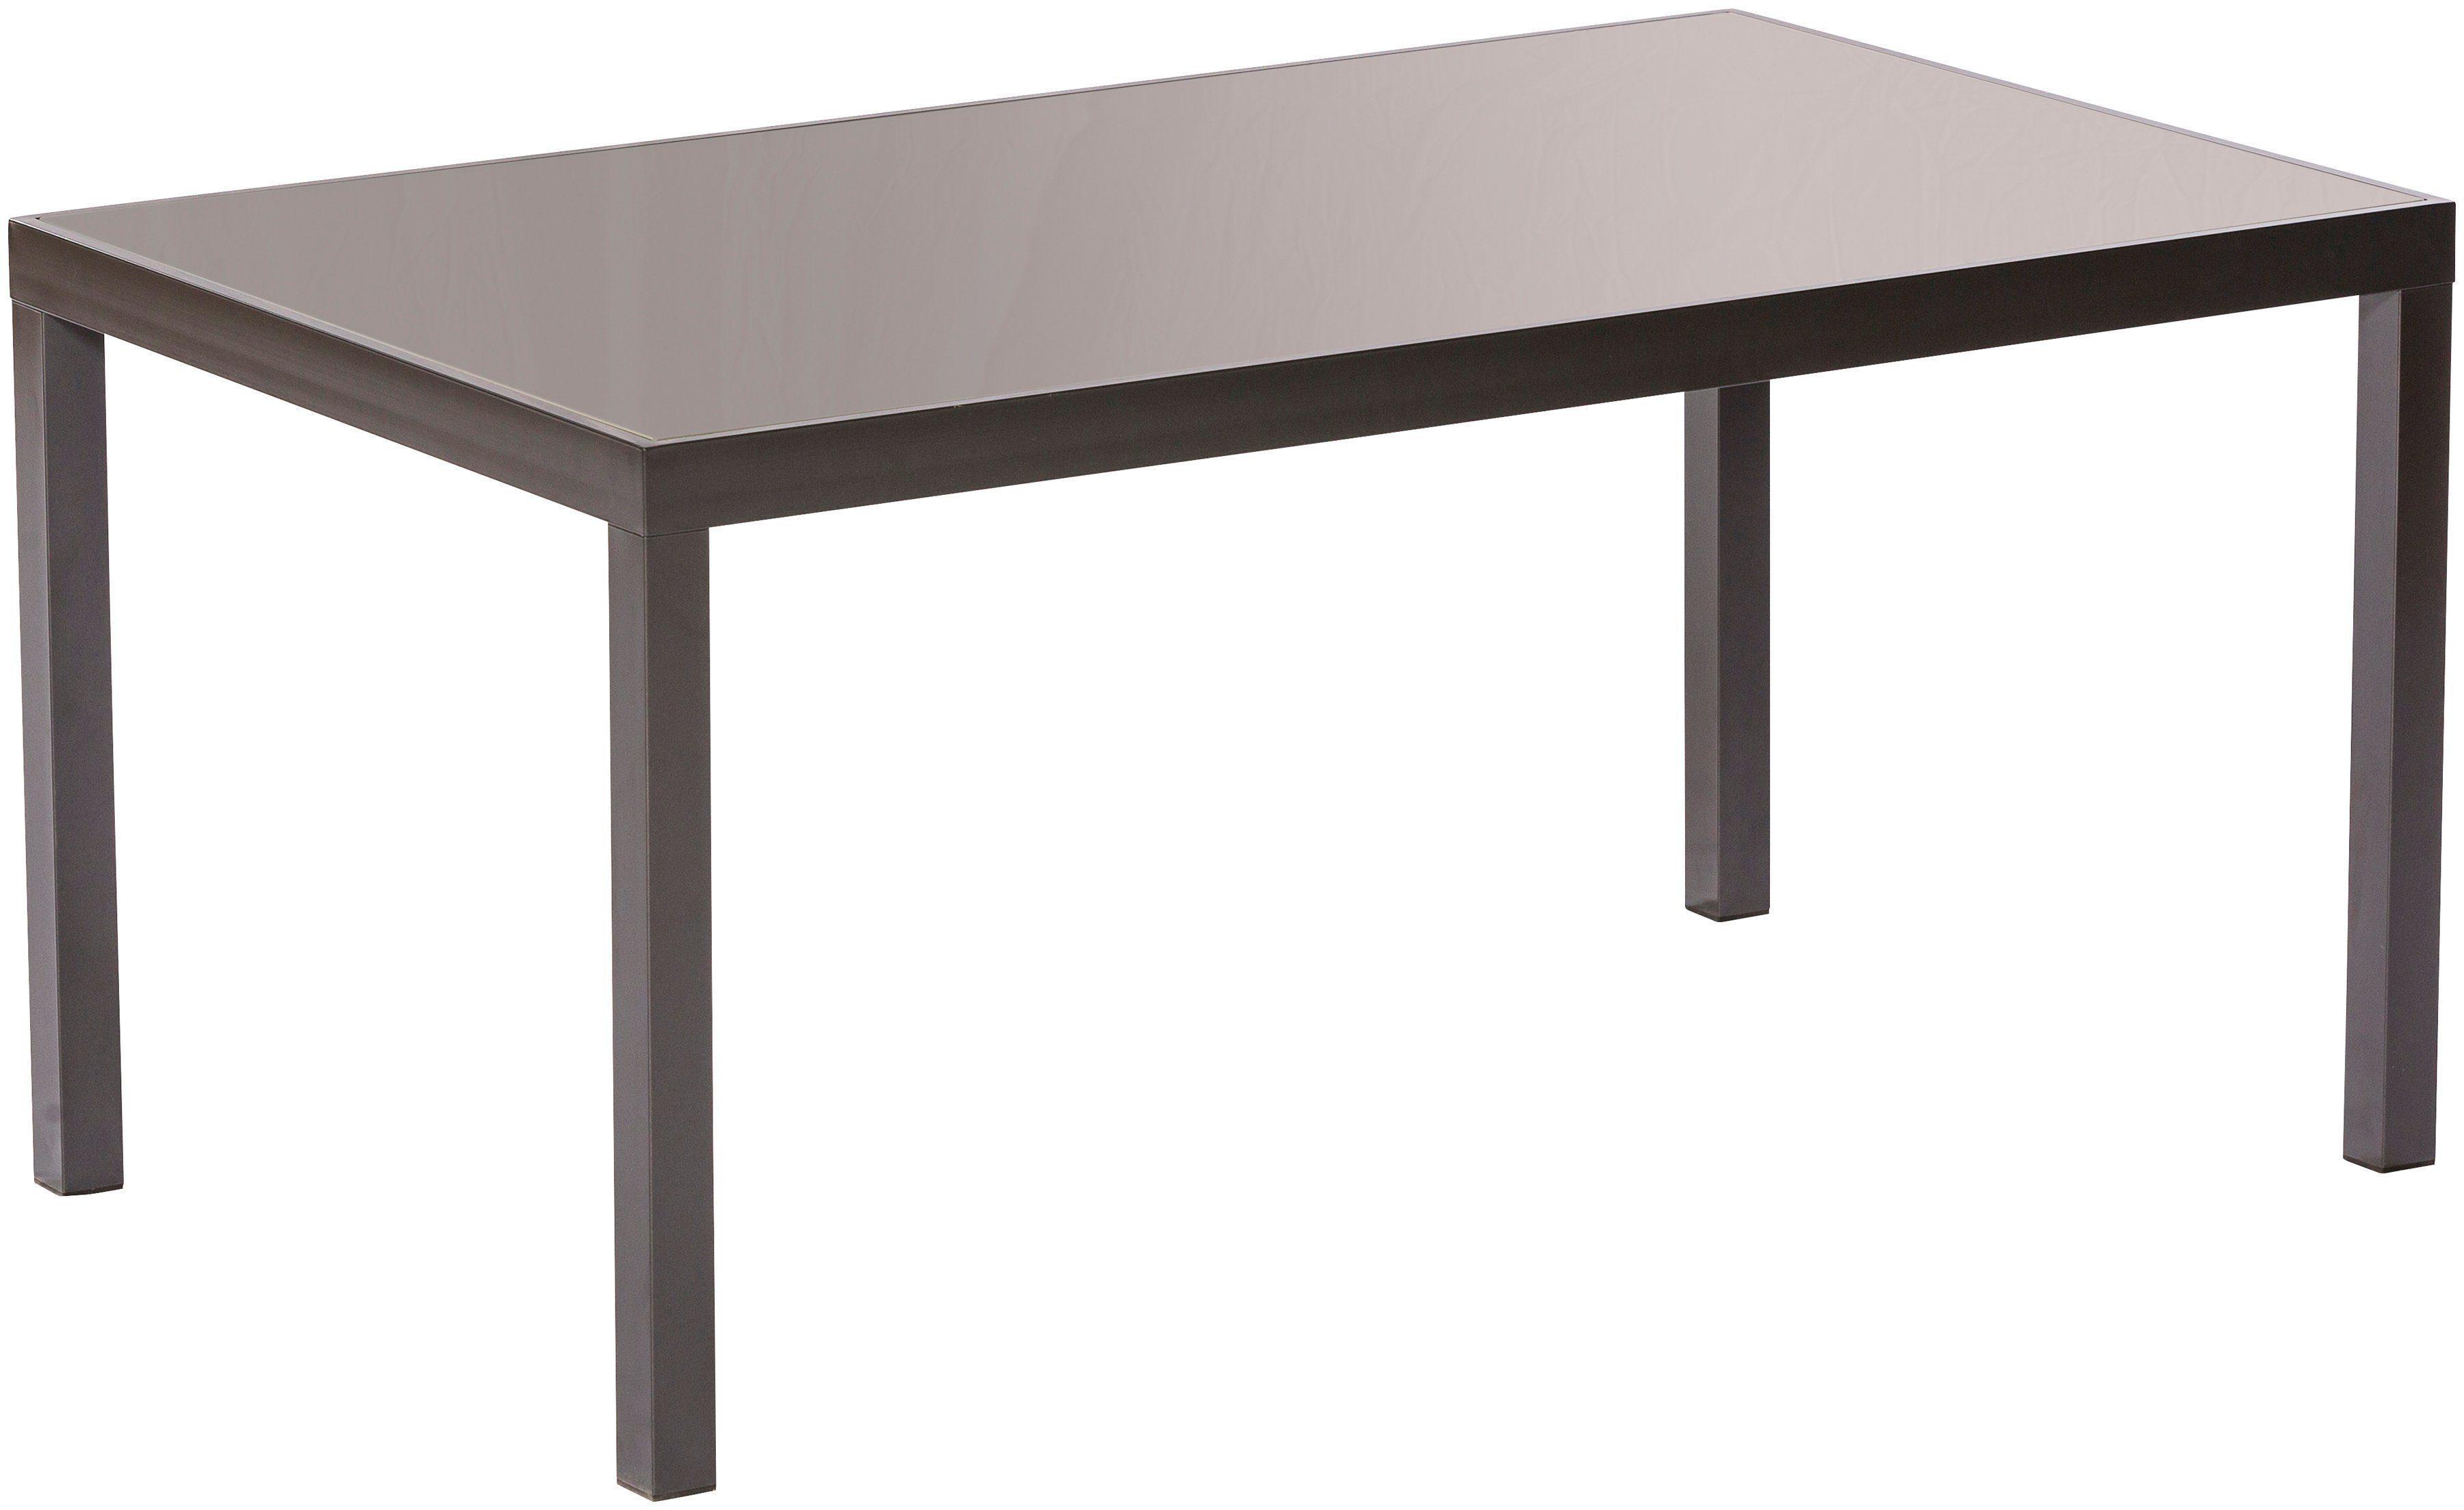 MERXX Gartentisch »Trivero Deluxe«, Aluminium, 150x90 cm, grau